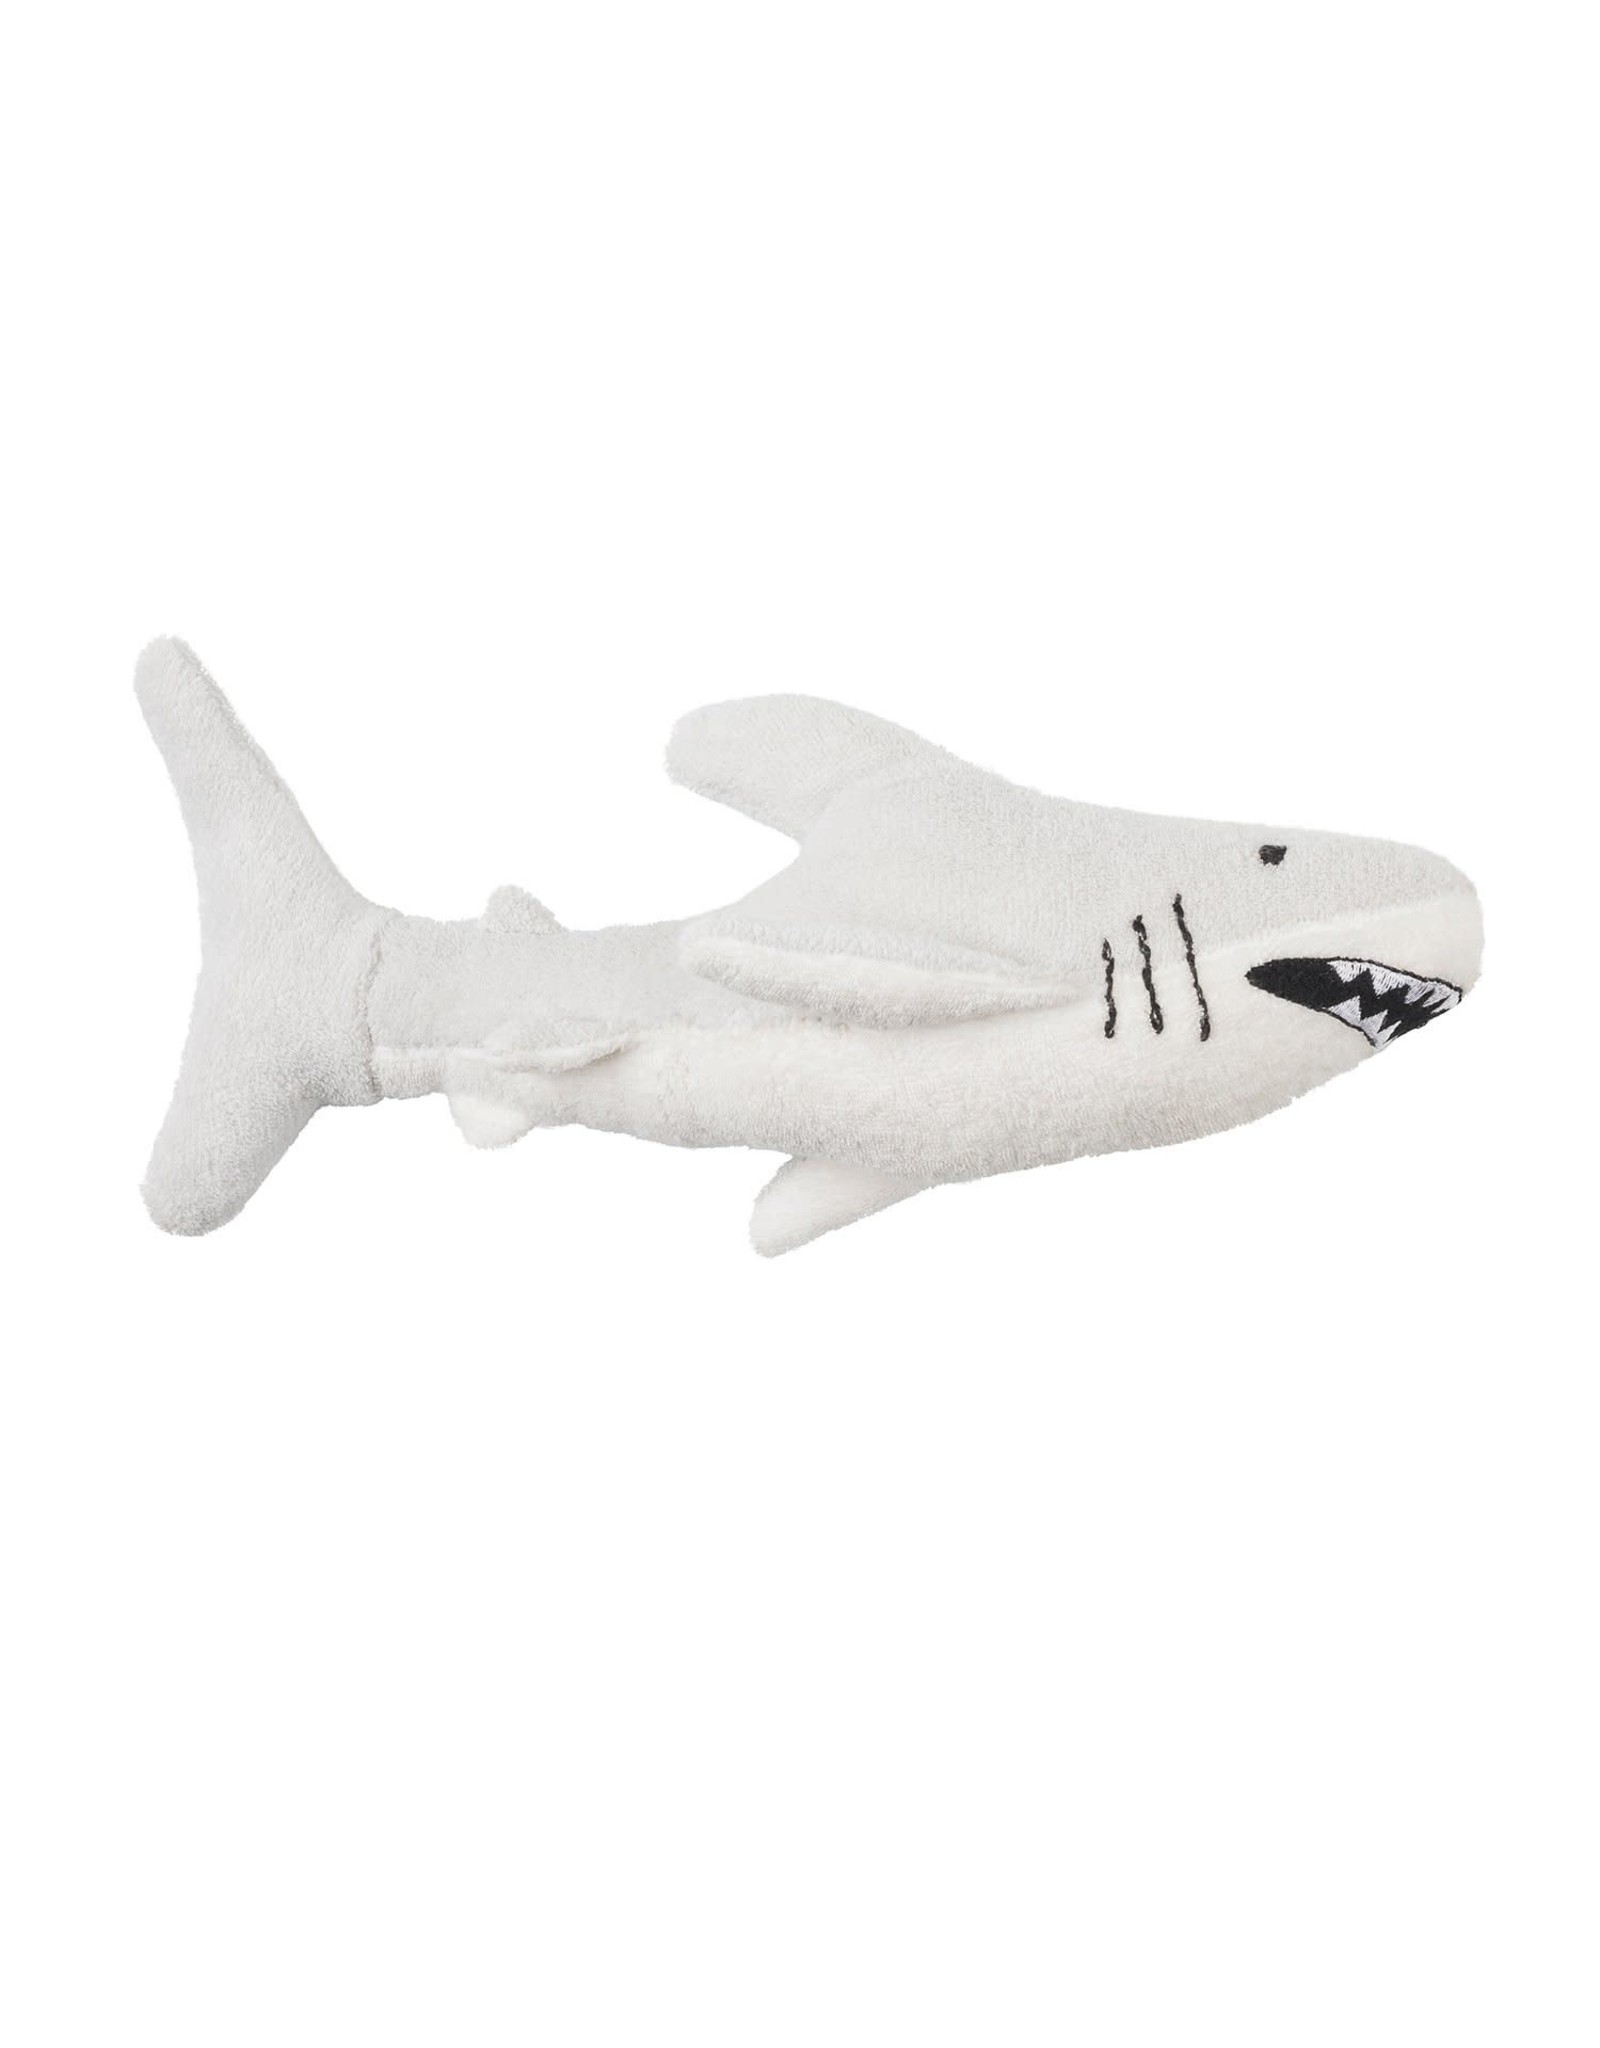 Chompy the Shark Plush Toy